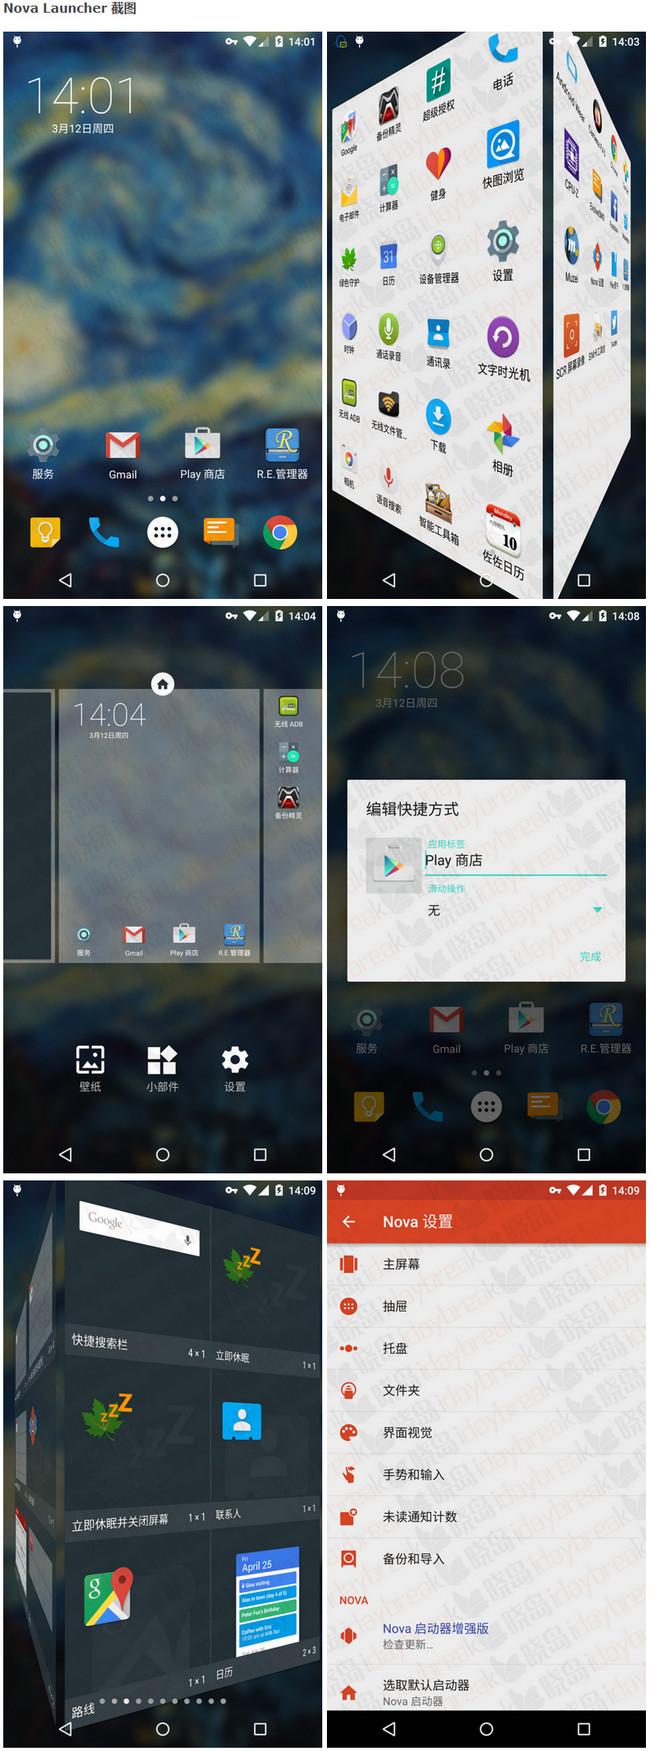 Nova启动器 v5.5.4 最新增强版的照片 - 3